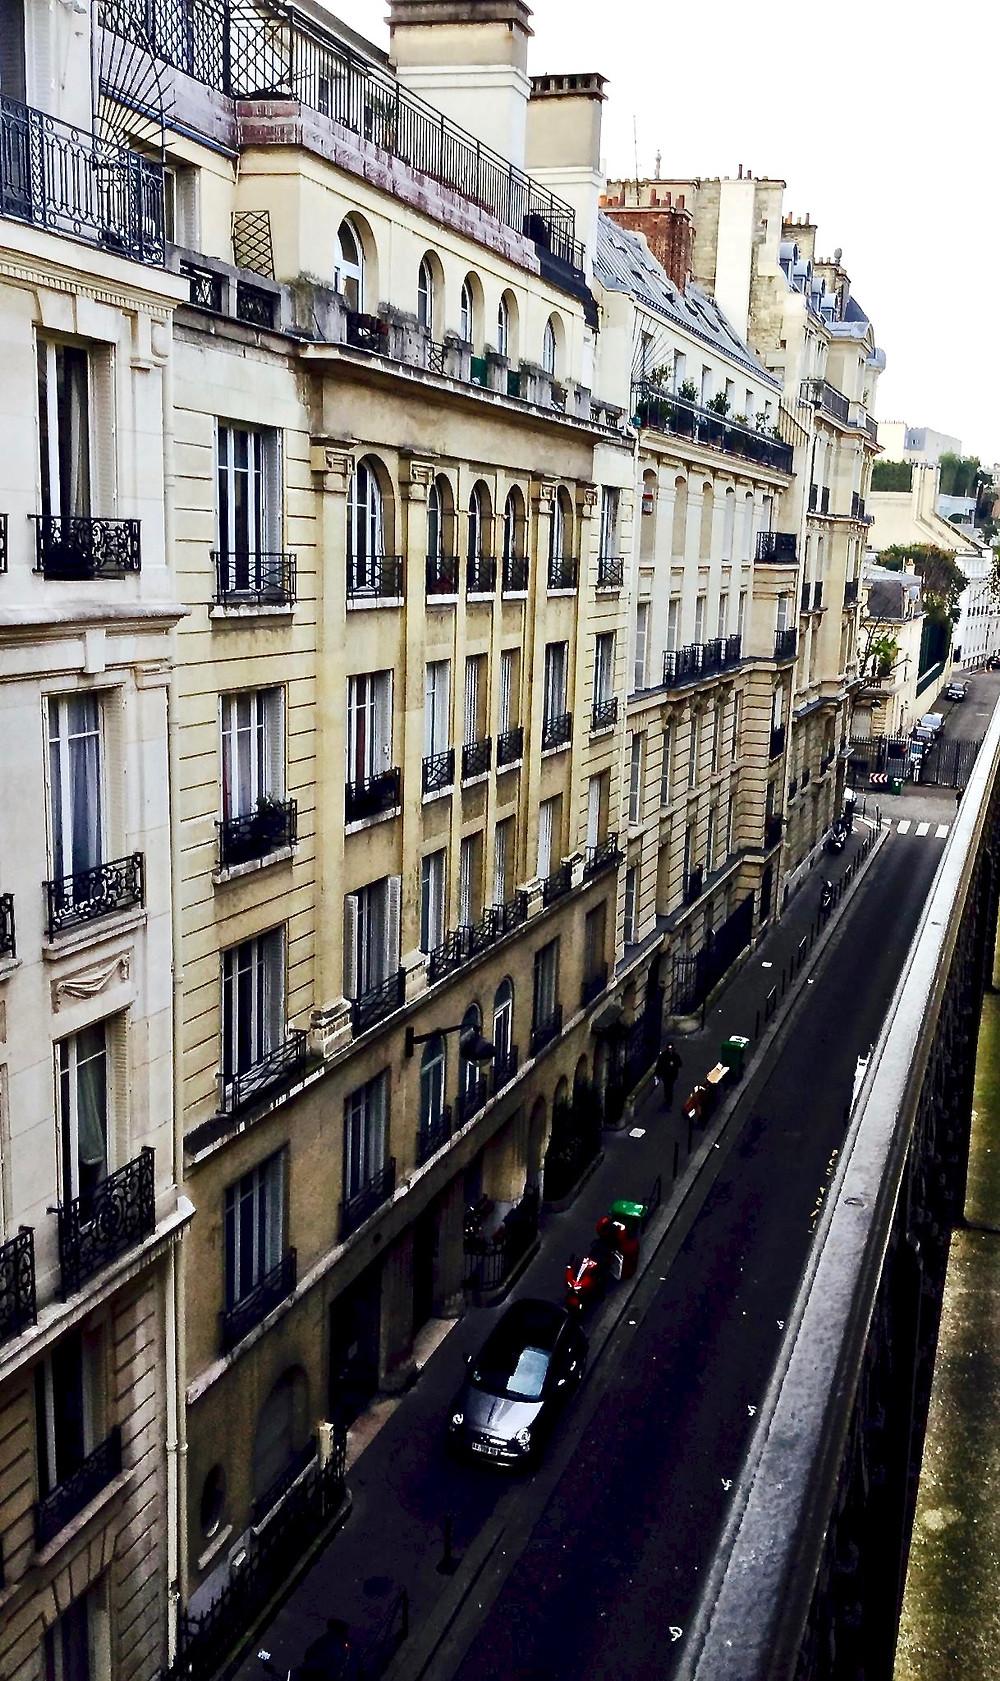 Rue Picot, site of my apartment in the 16th arrondissement of Paris